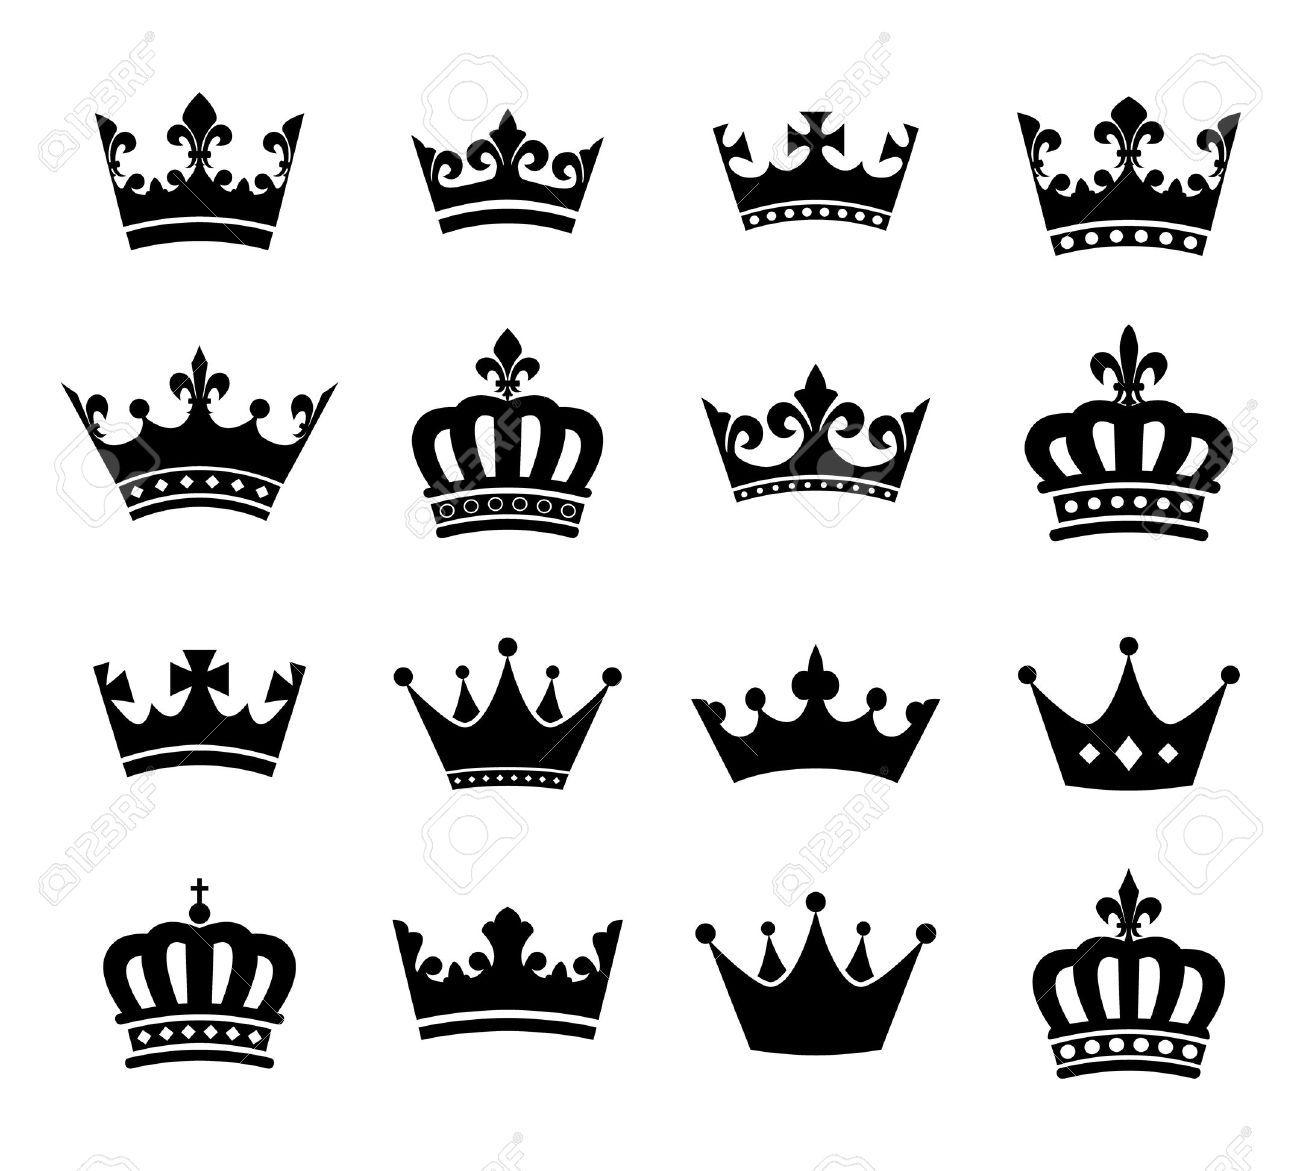 Image Result For Corona Princesa Silueta